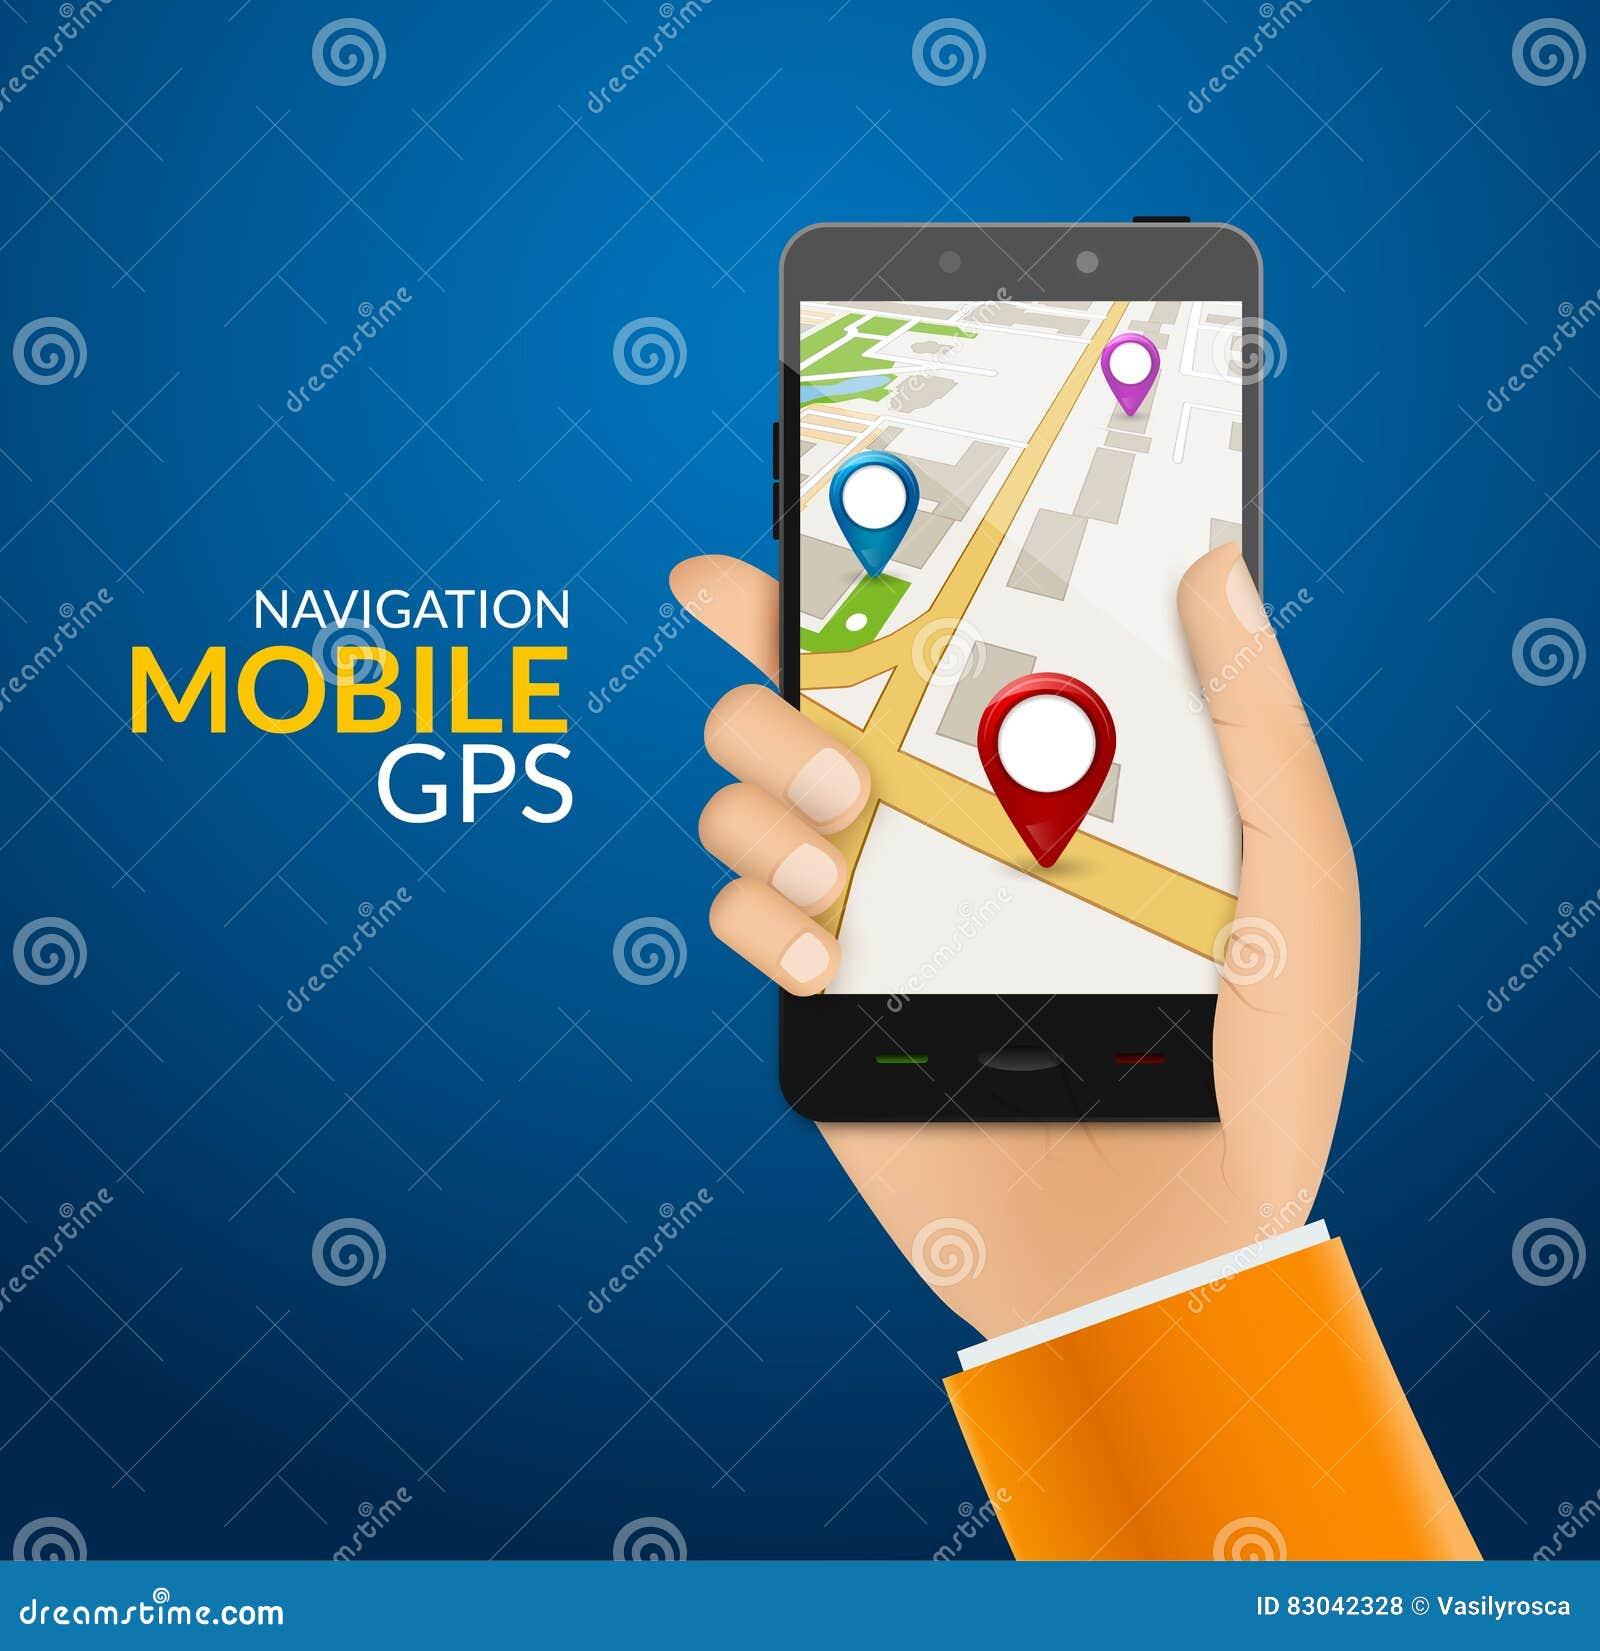 GPS Phone Navigation - Mobile Gps And Tracking Concept  Hand